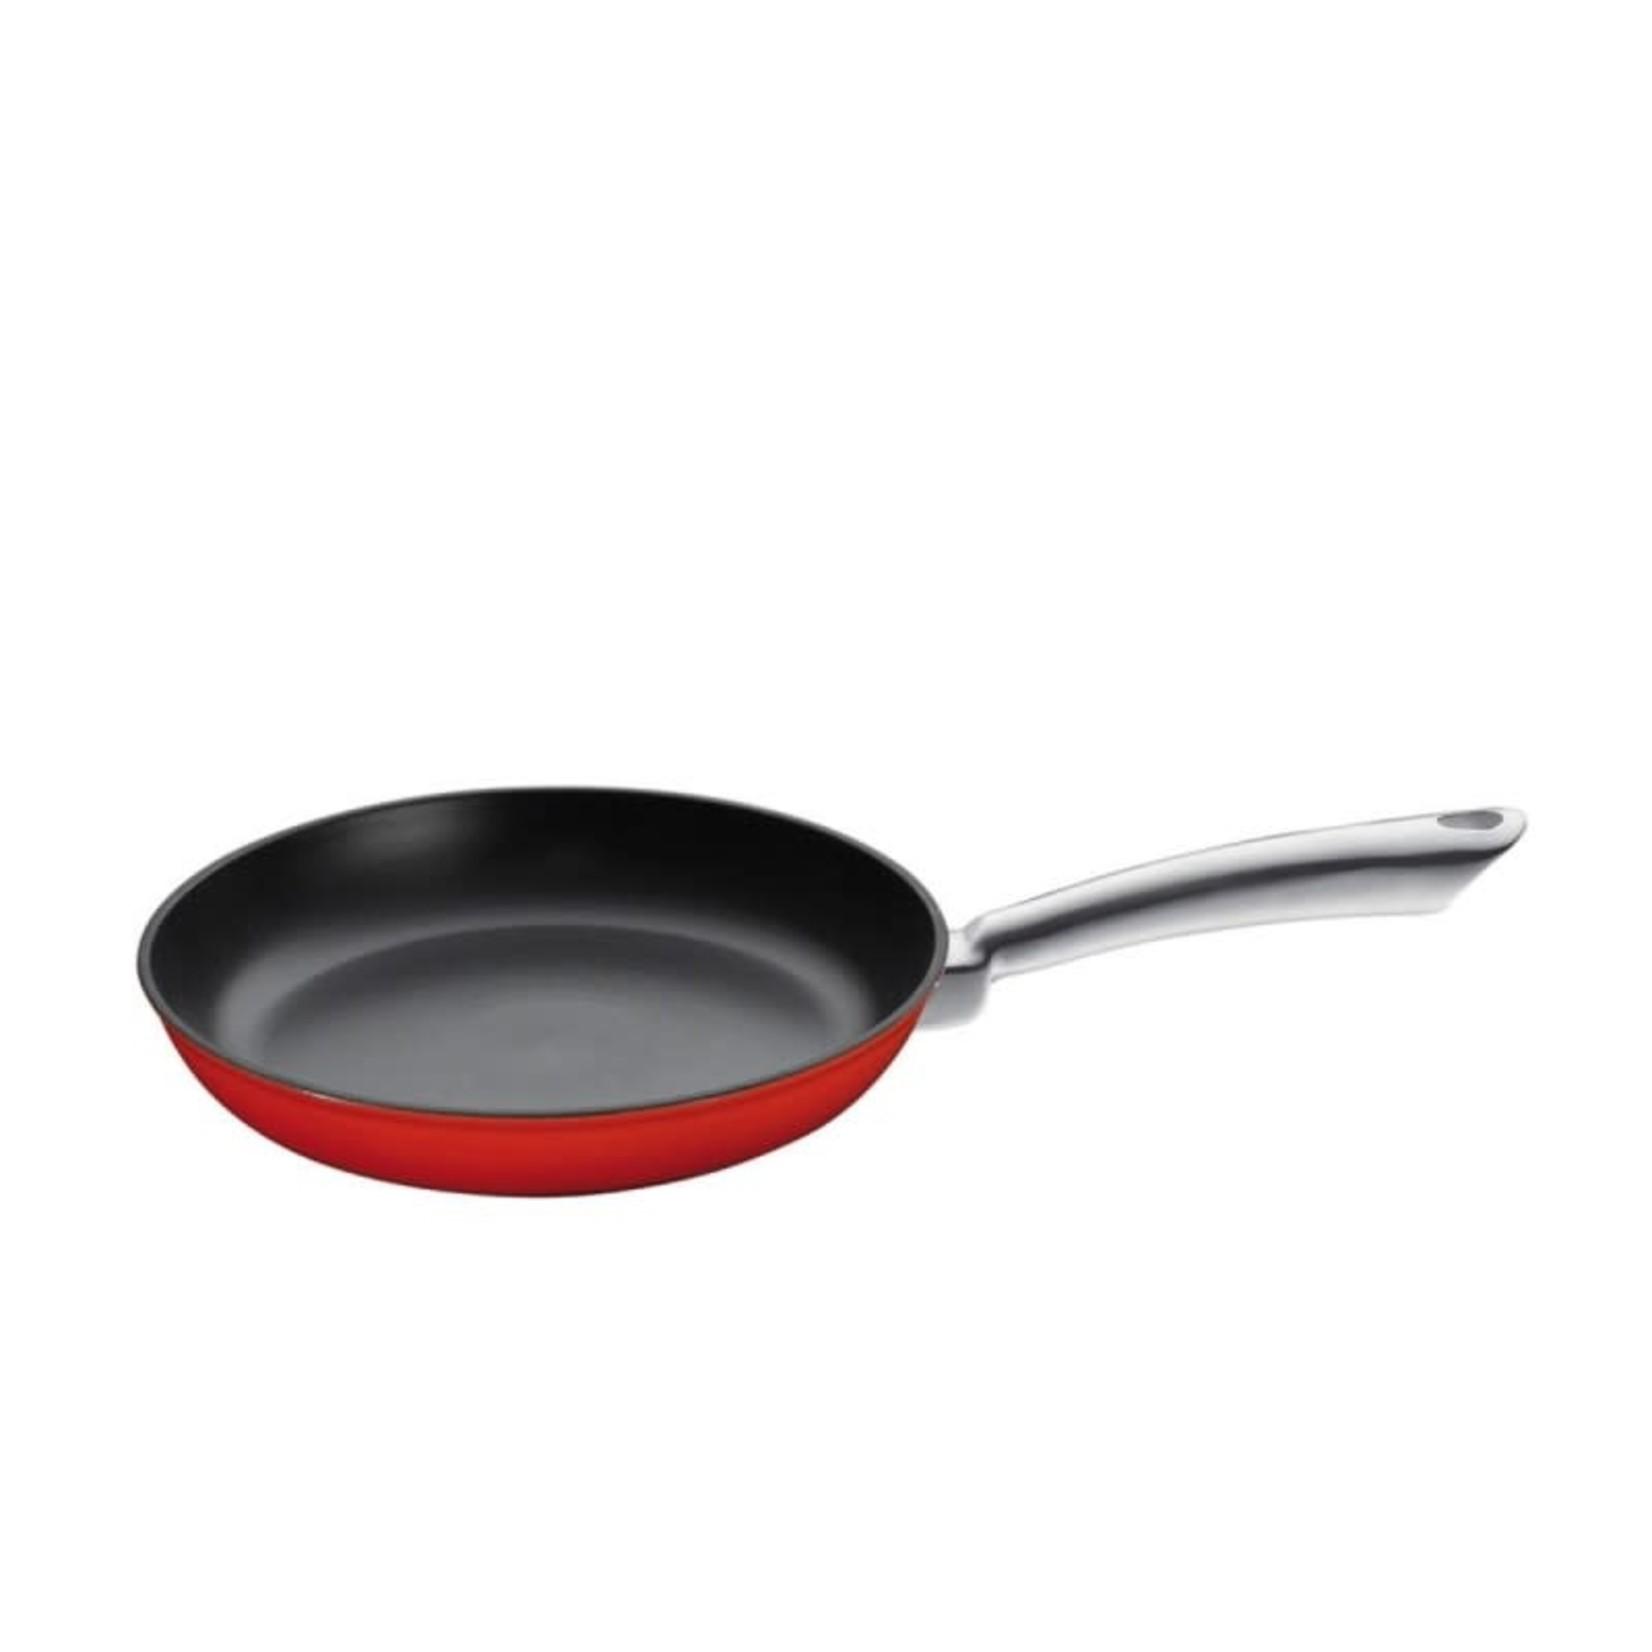 Küchenprofi Koekenpan gietijzer Rood 20cm